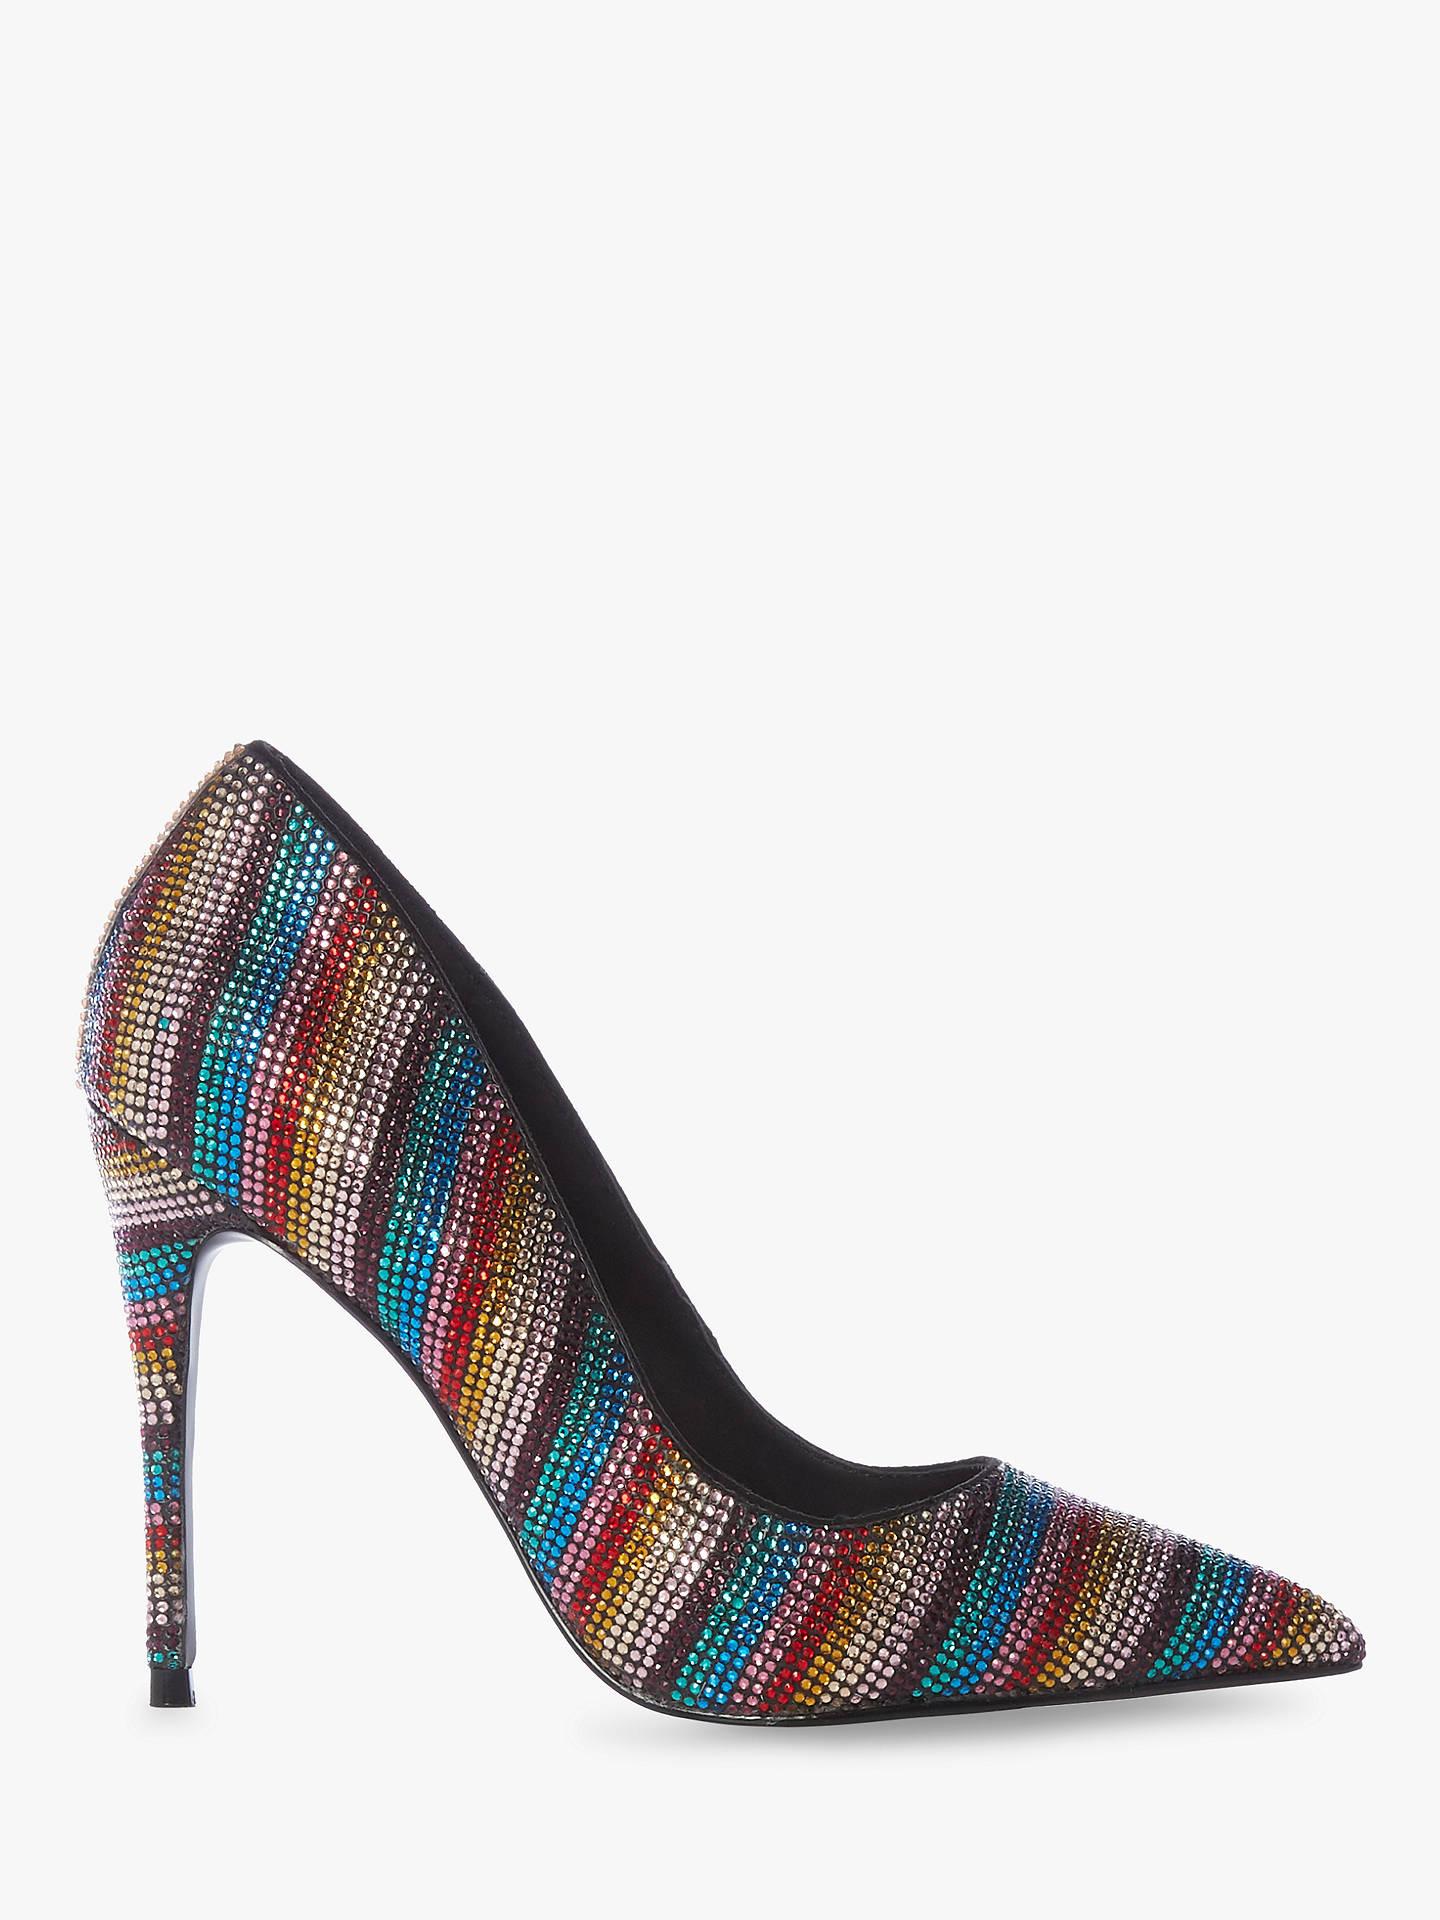 b13103c6182 Steve Madden Daisie Stiletto Heel Court Shoes at John Lewis   Partners